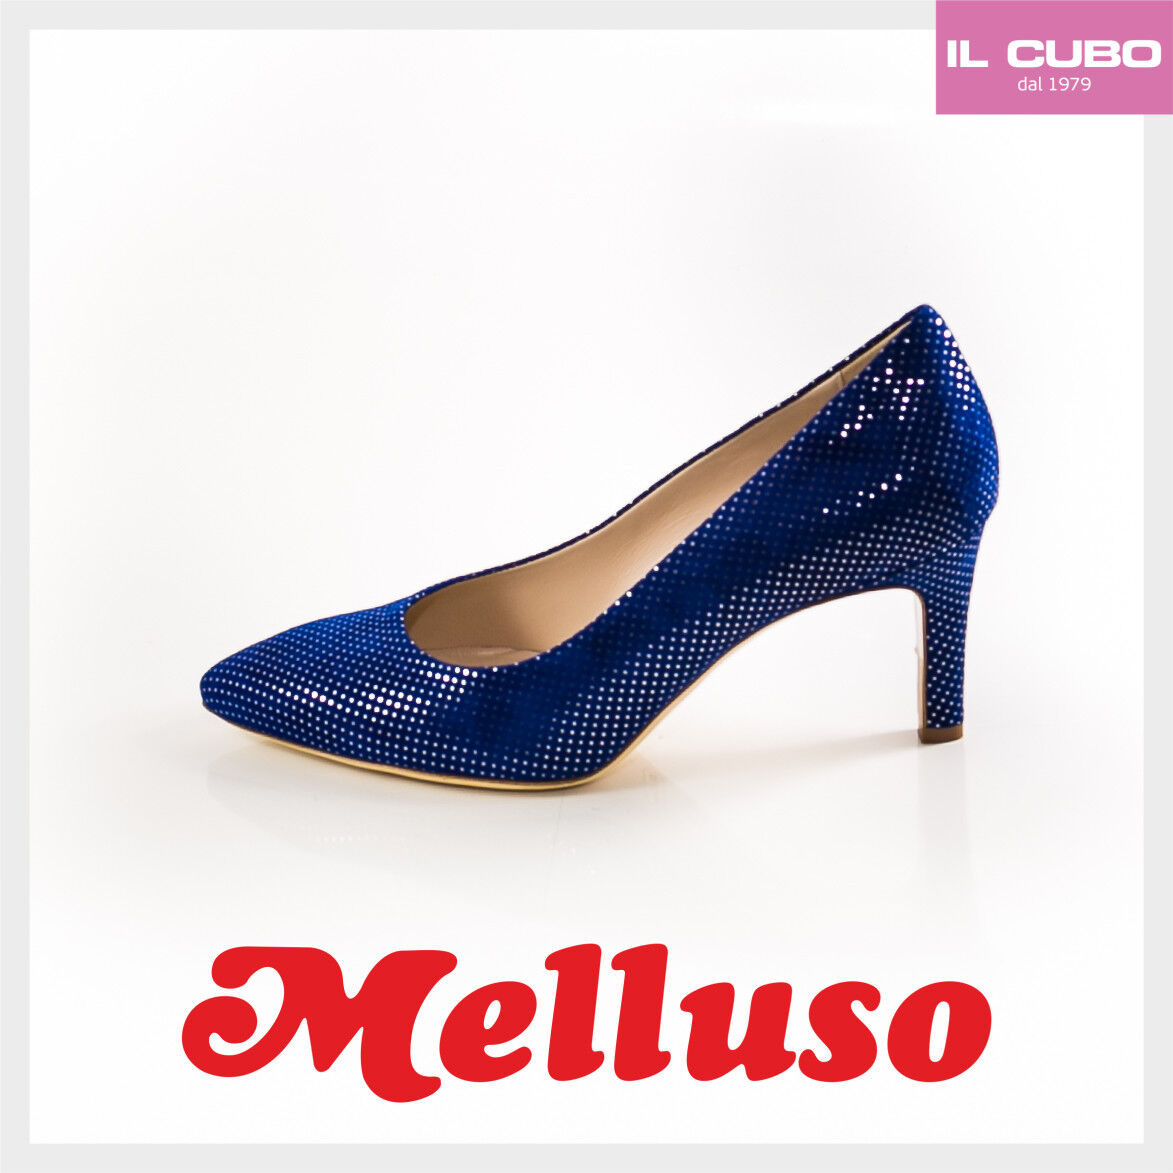 MELLUSO SCARPA women DECOLTE' CAMOSCIO color blueETTE TACCO H 7 CM MADE IN ITALY